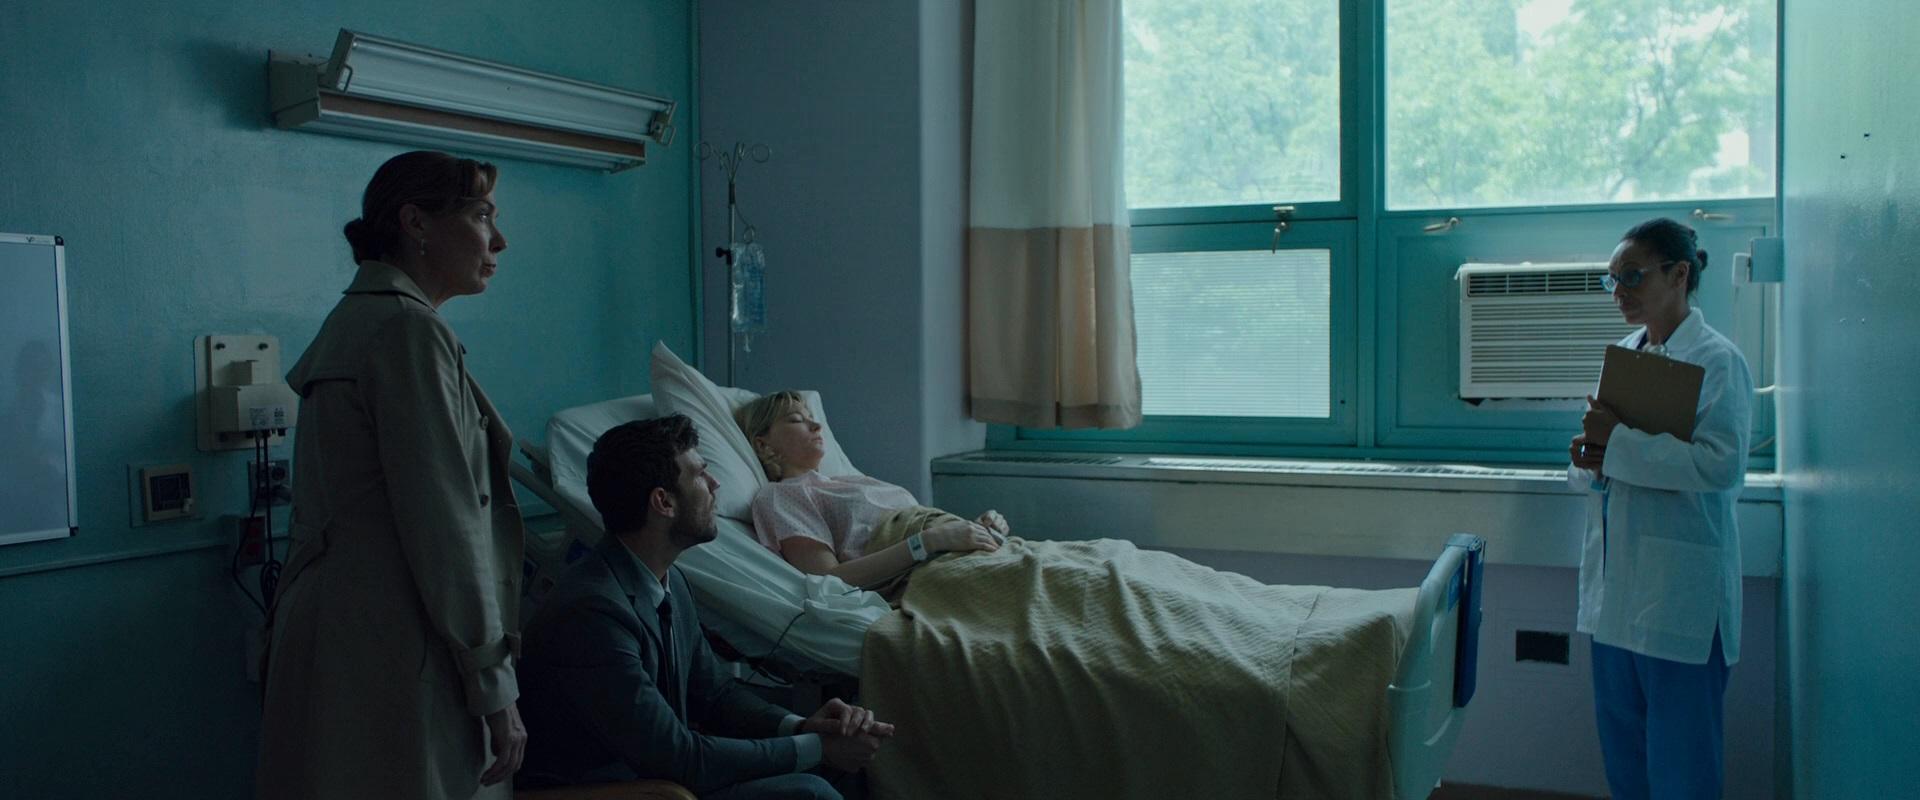 Saplantı | Swallow | 2020 | BDRip | XviD | Türkçe Dublaj | m720p - m1080p | BluRay | Dual | TR-EN | Tek Link